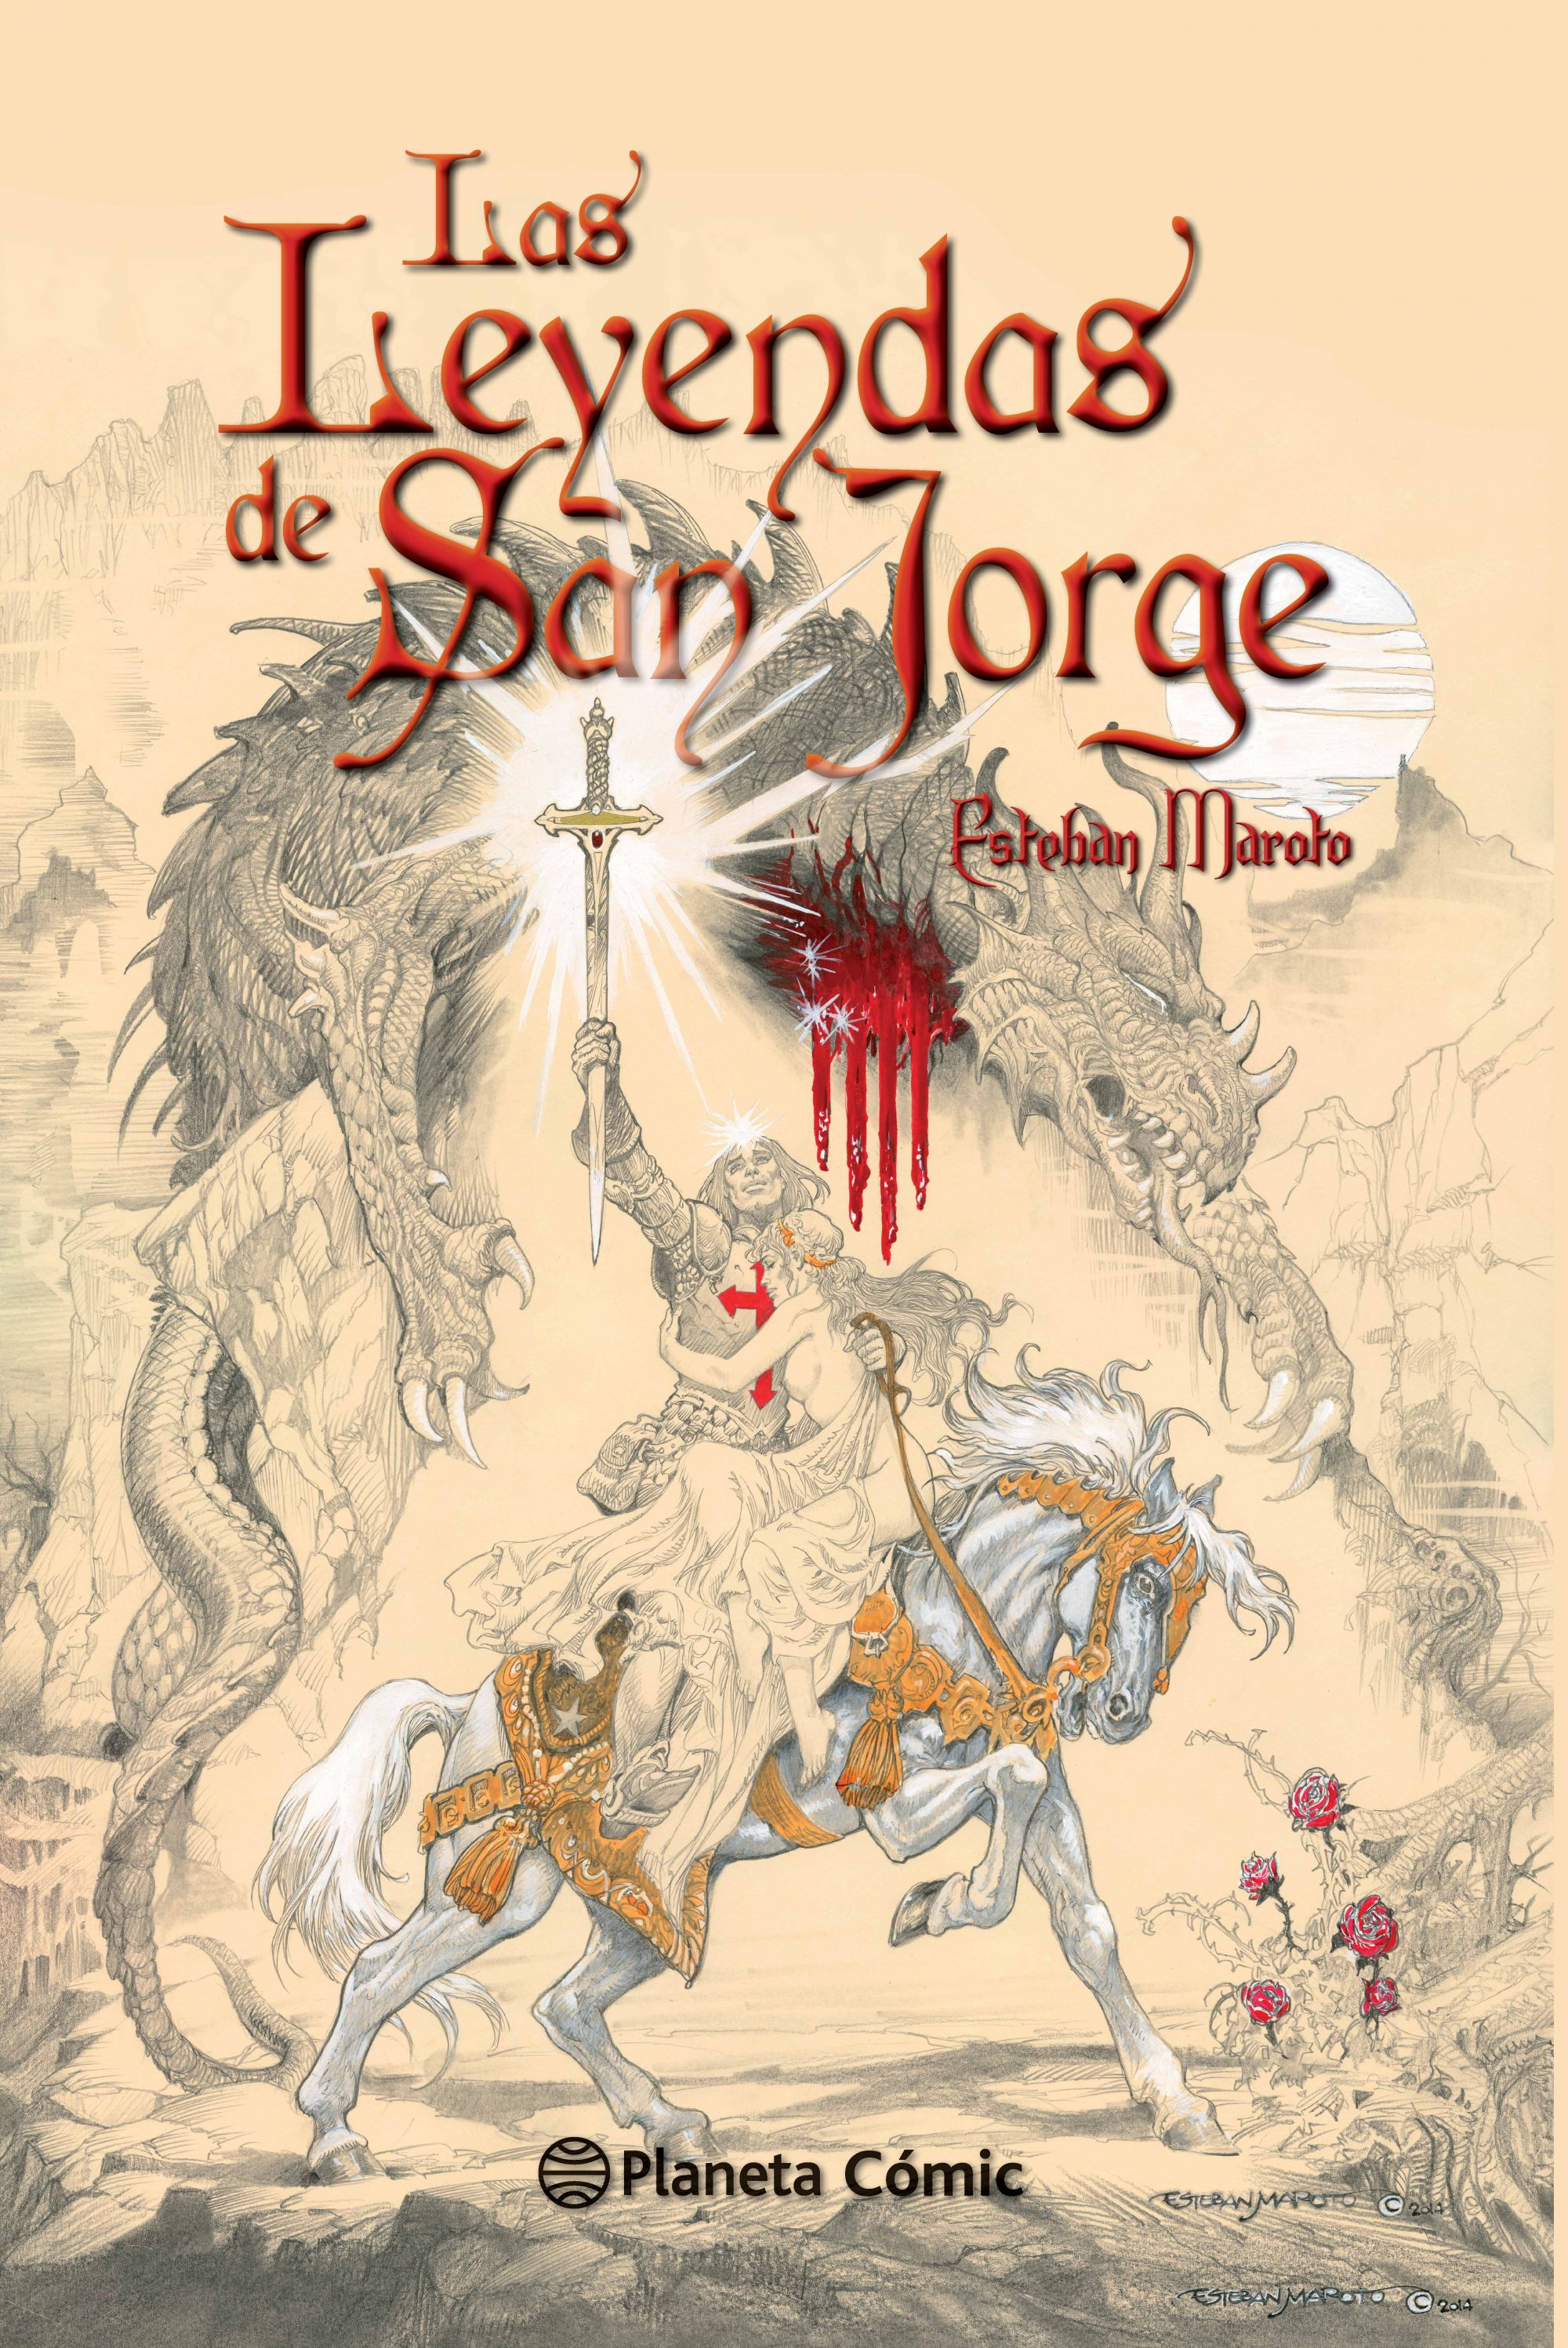 Reseña: «Las Leyendas de San Jorge», de Esteban Maroto